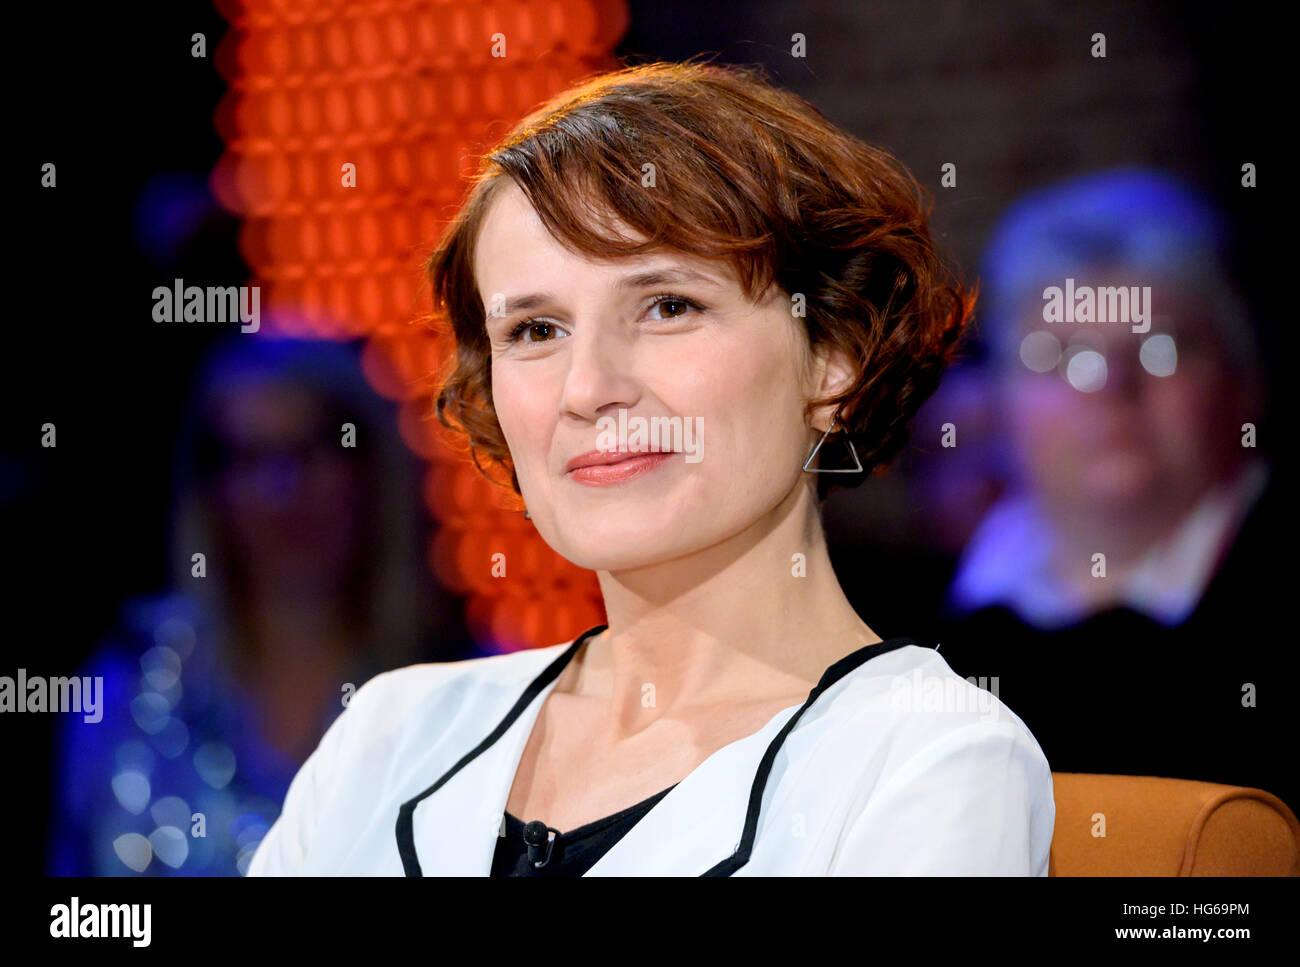 Fein Neun Draht Fotos - Der Schaltplan - greigo.com